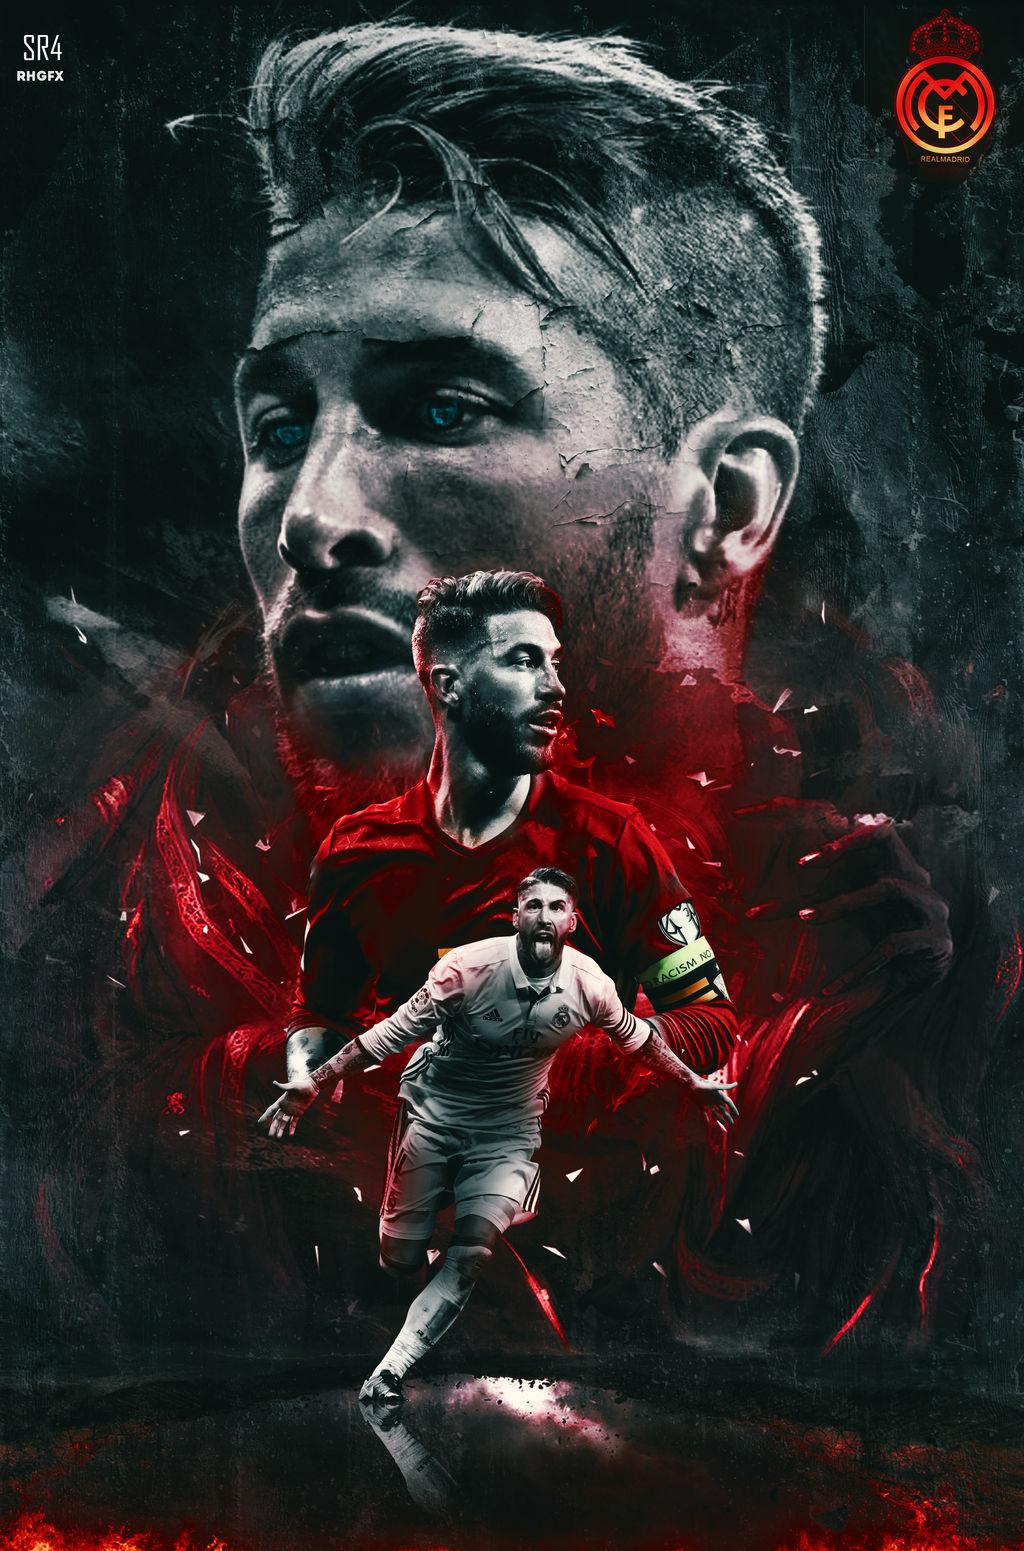 Sergio Ramos 2018 Wallpaper Hd By Rhgfx2 On Deviantart